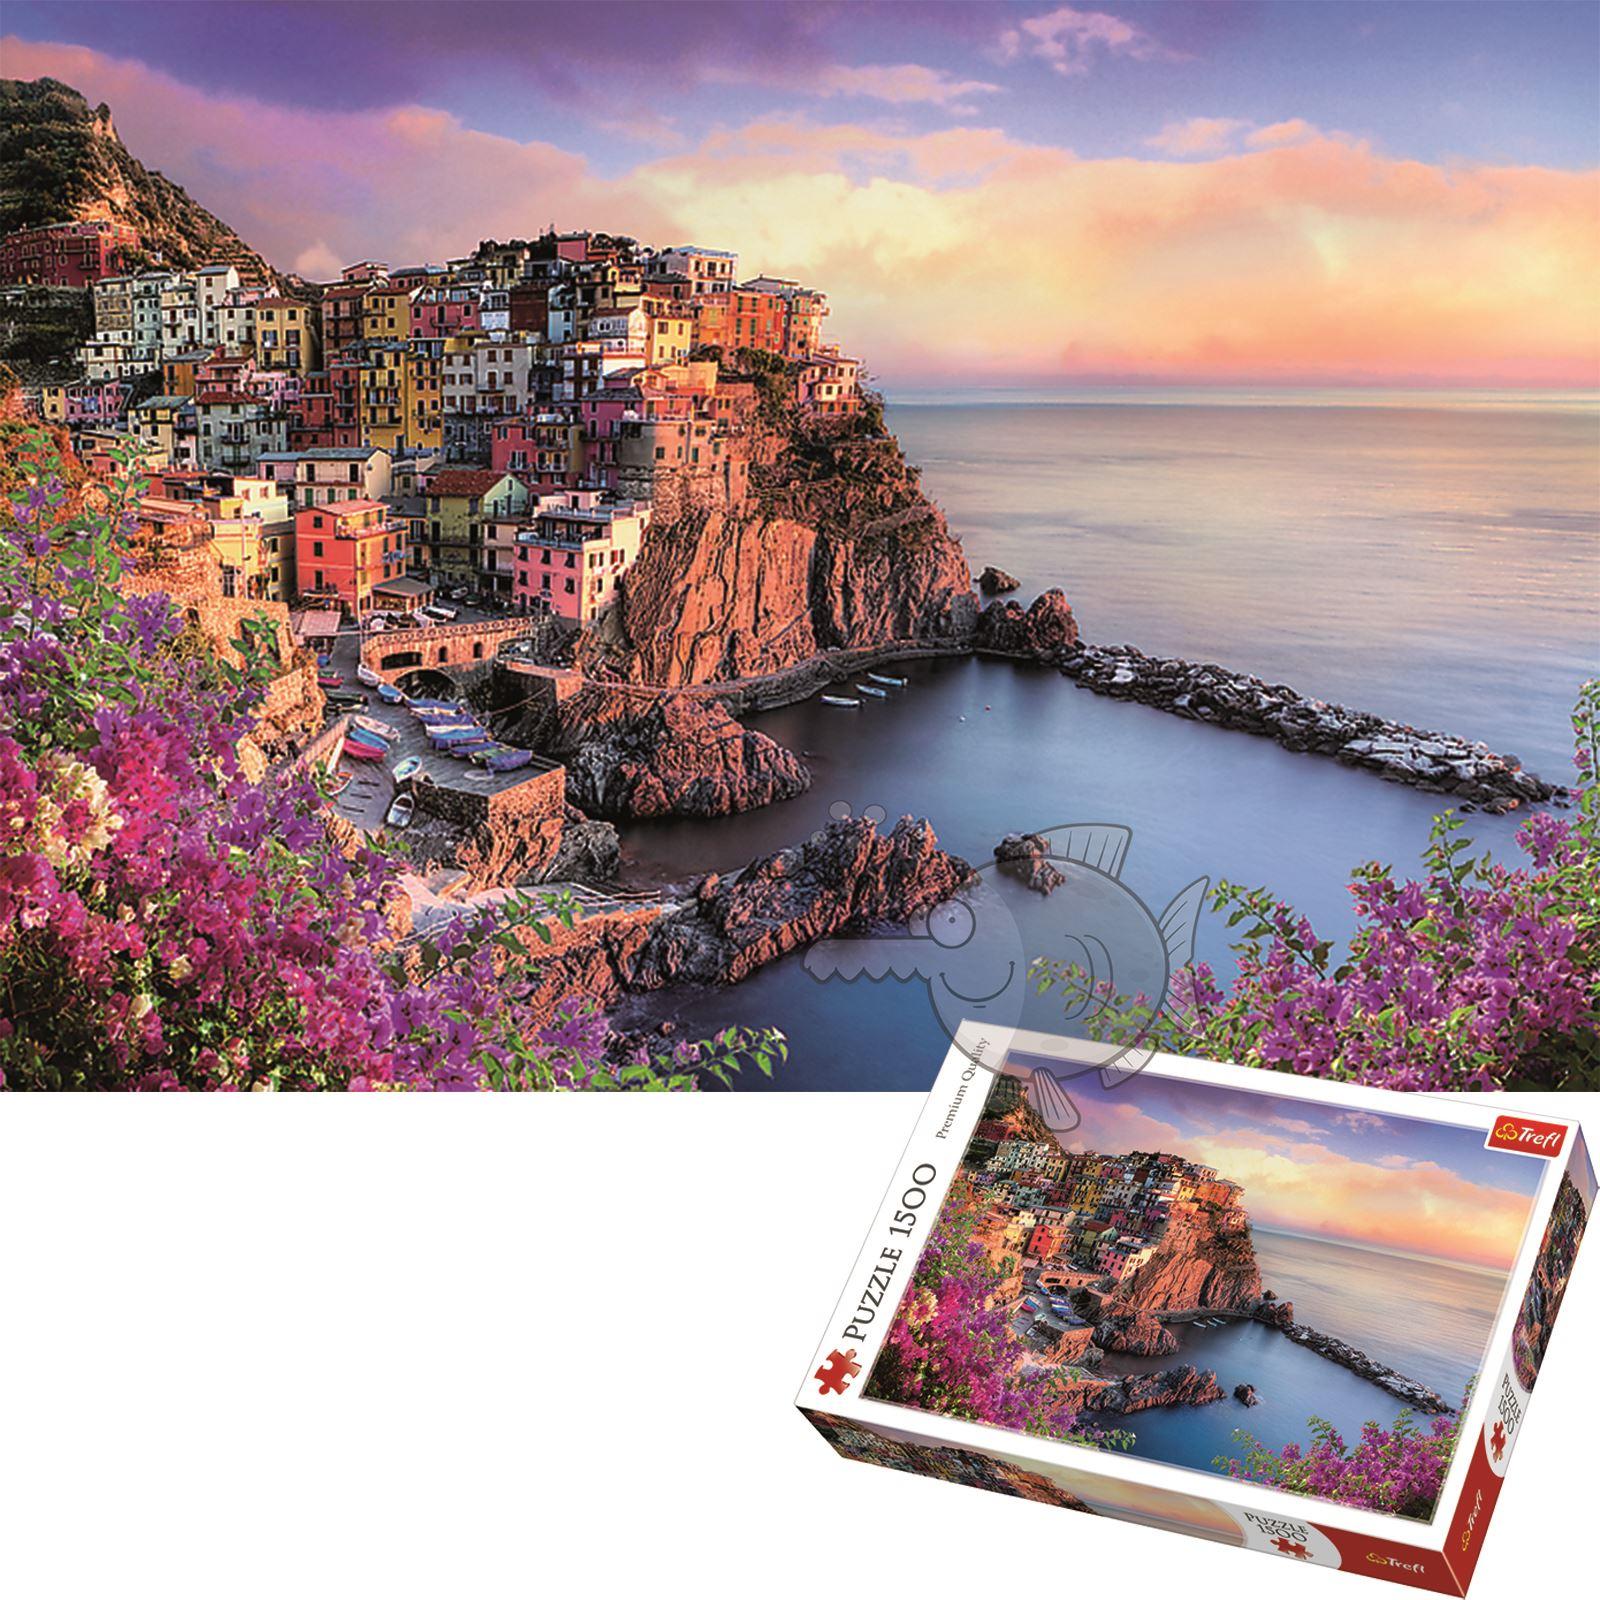 Trefl-300-500-1000-1500-2000-3000-4000-6000-Piece-Jigsaw-Puzzle-Landscapes-City thumbnail 446